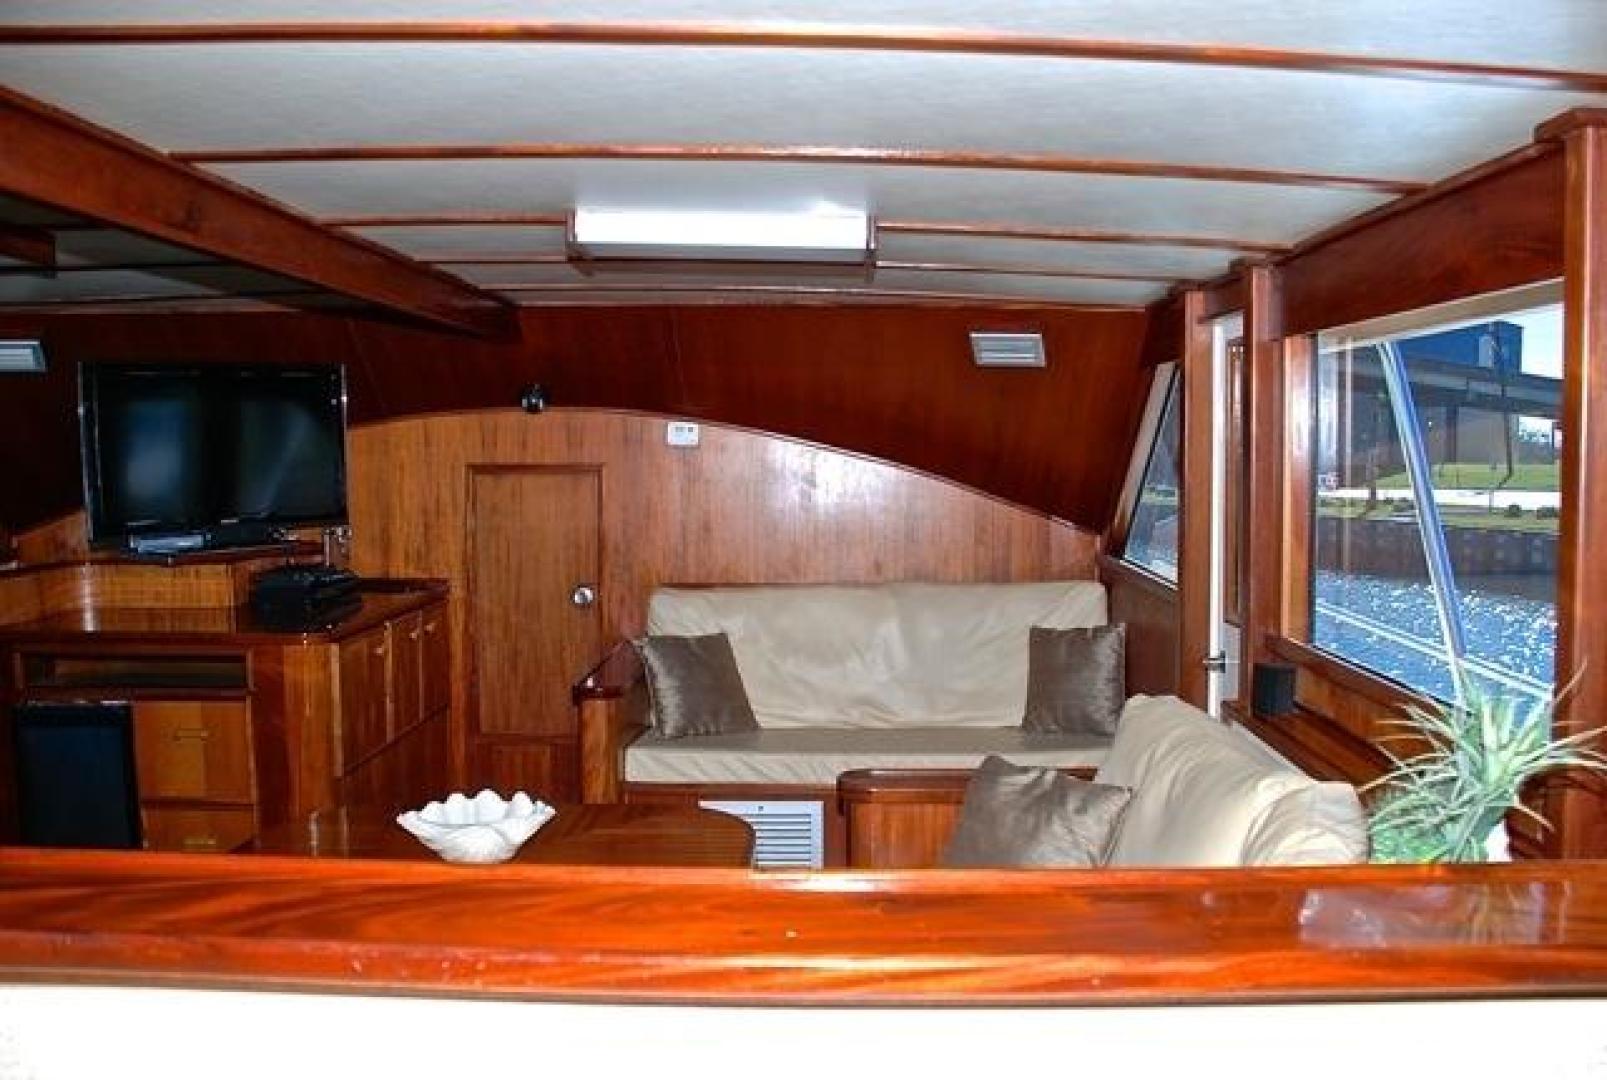 Infinity-Cockpit Motor Yacht 2001-Dont Matter Houston-Texas-United States-Salon View 2-1005538 | Thumbnail